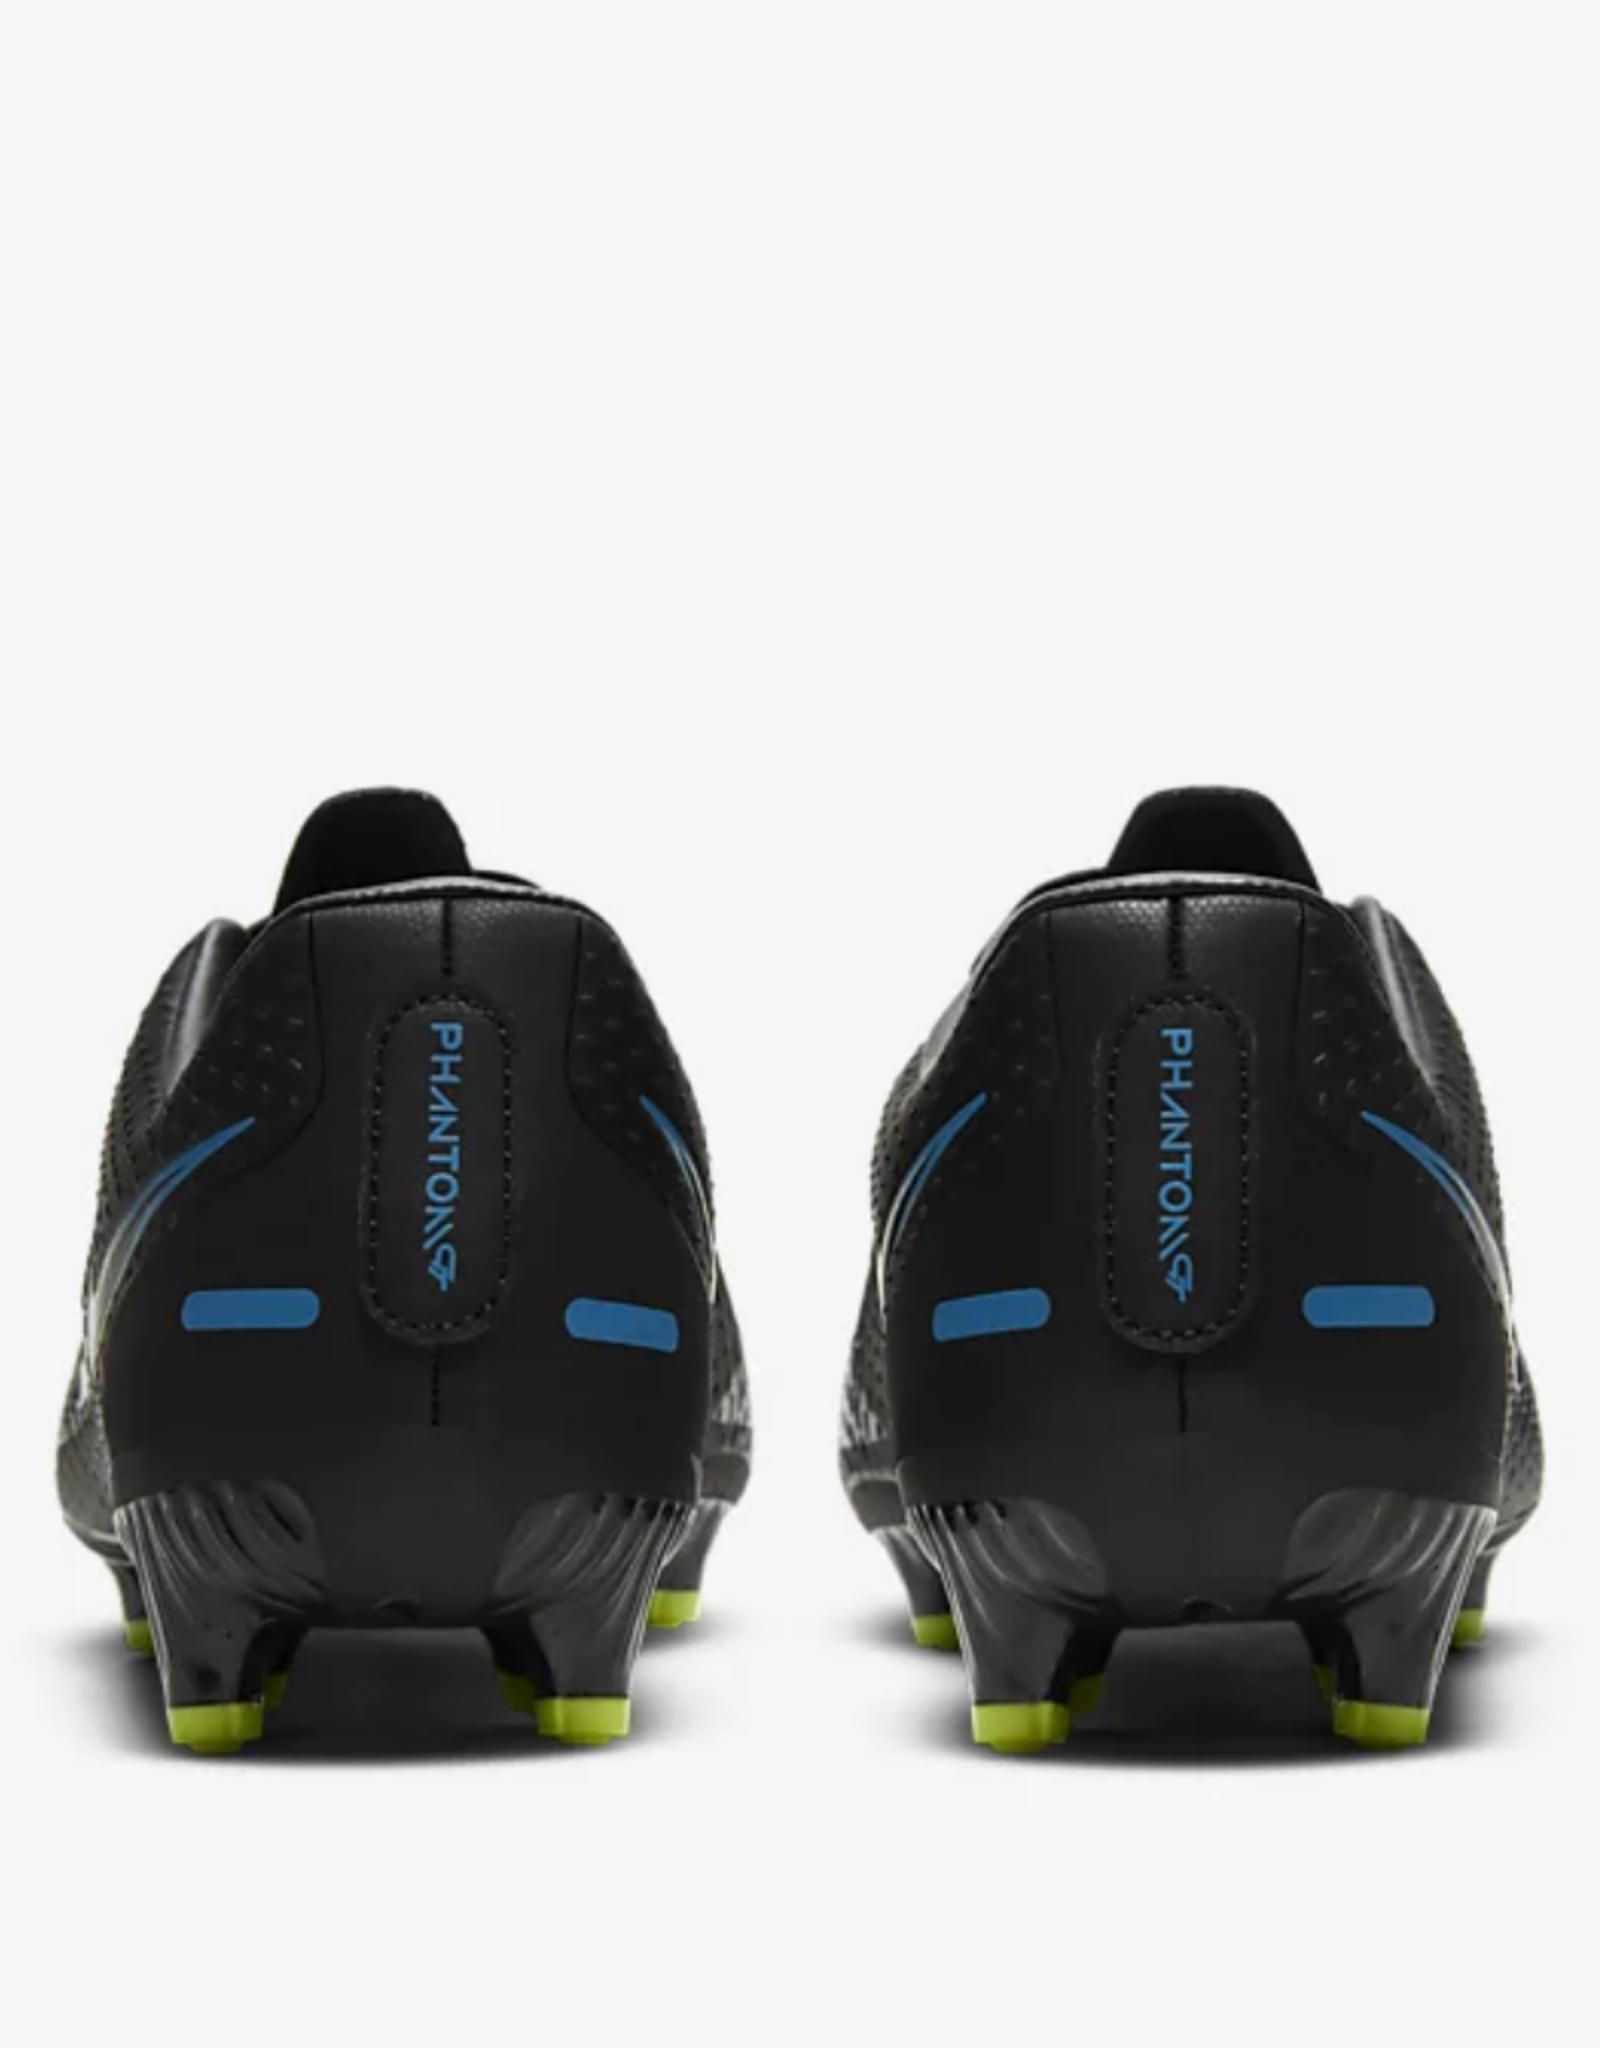 Nike Phantom GT Academy Multi-Ground Soccer Cleat Black